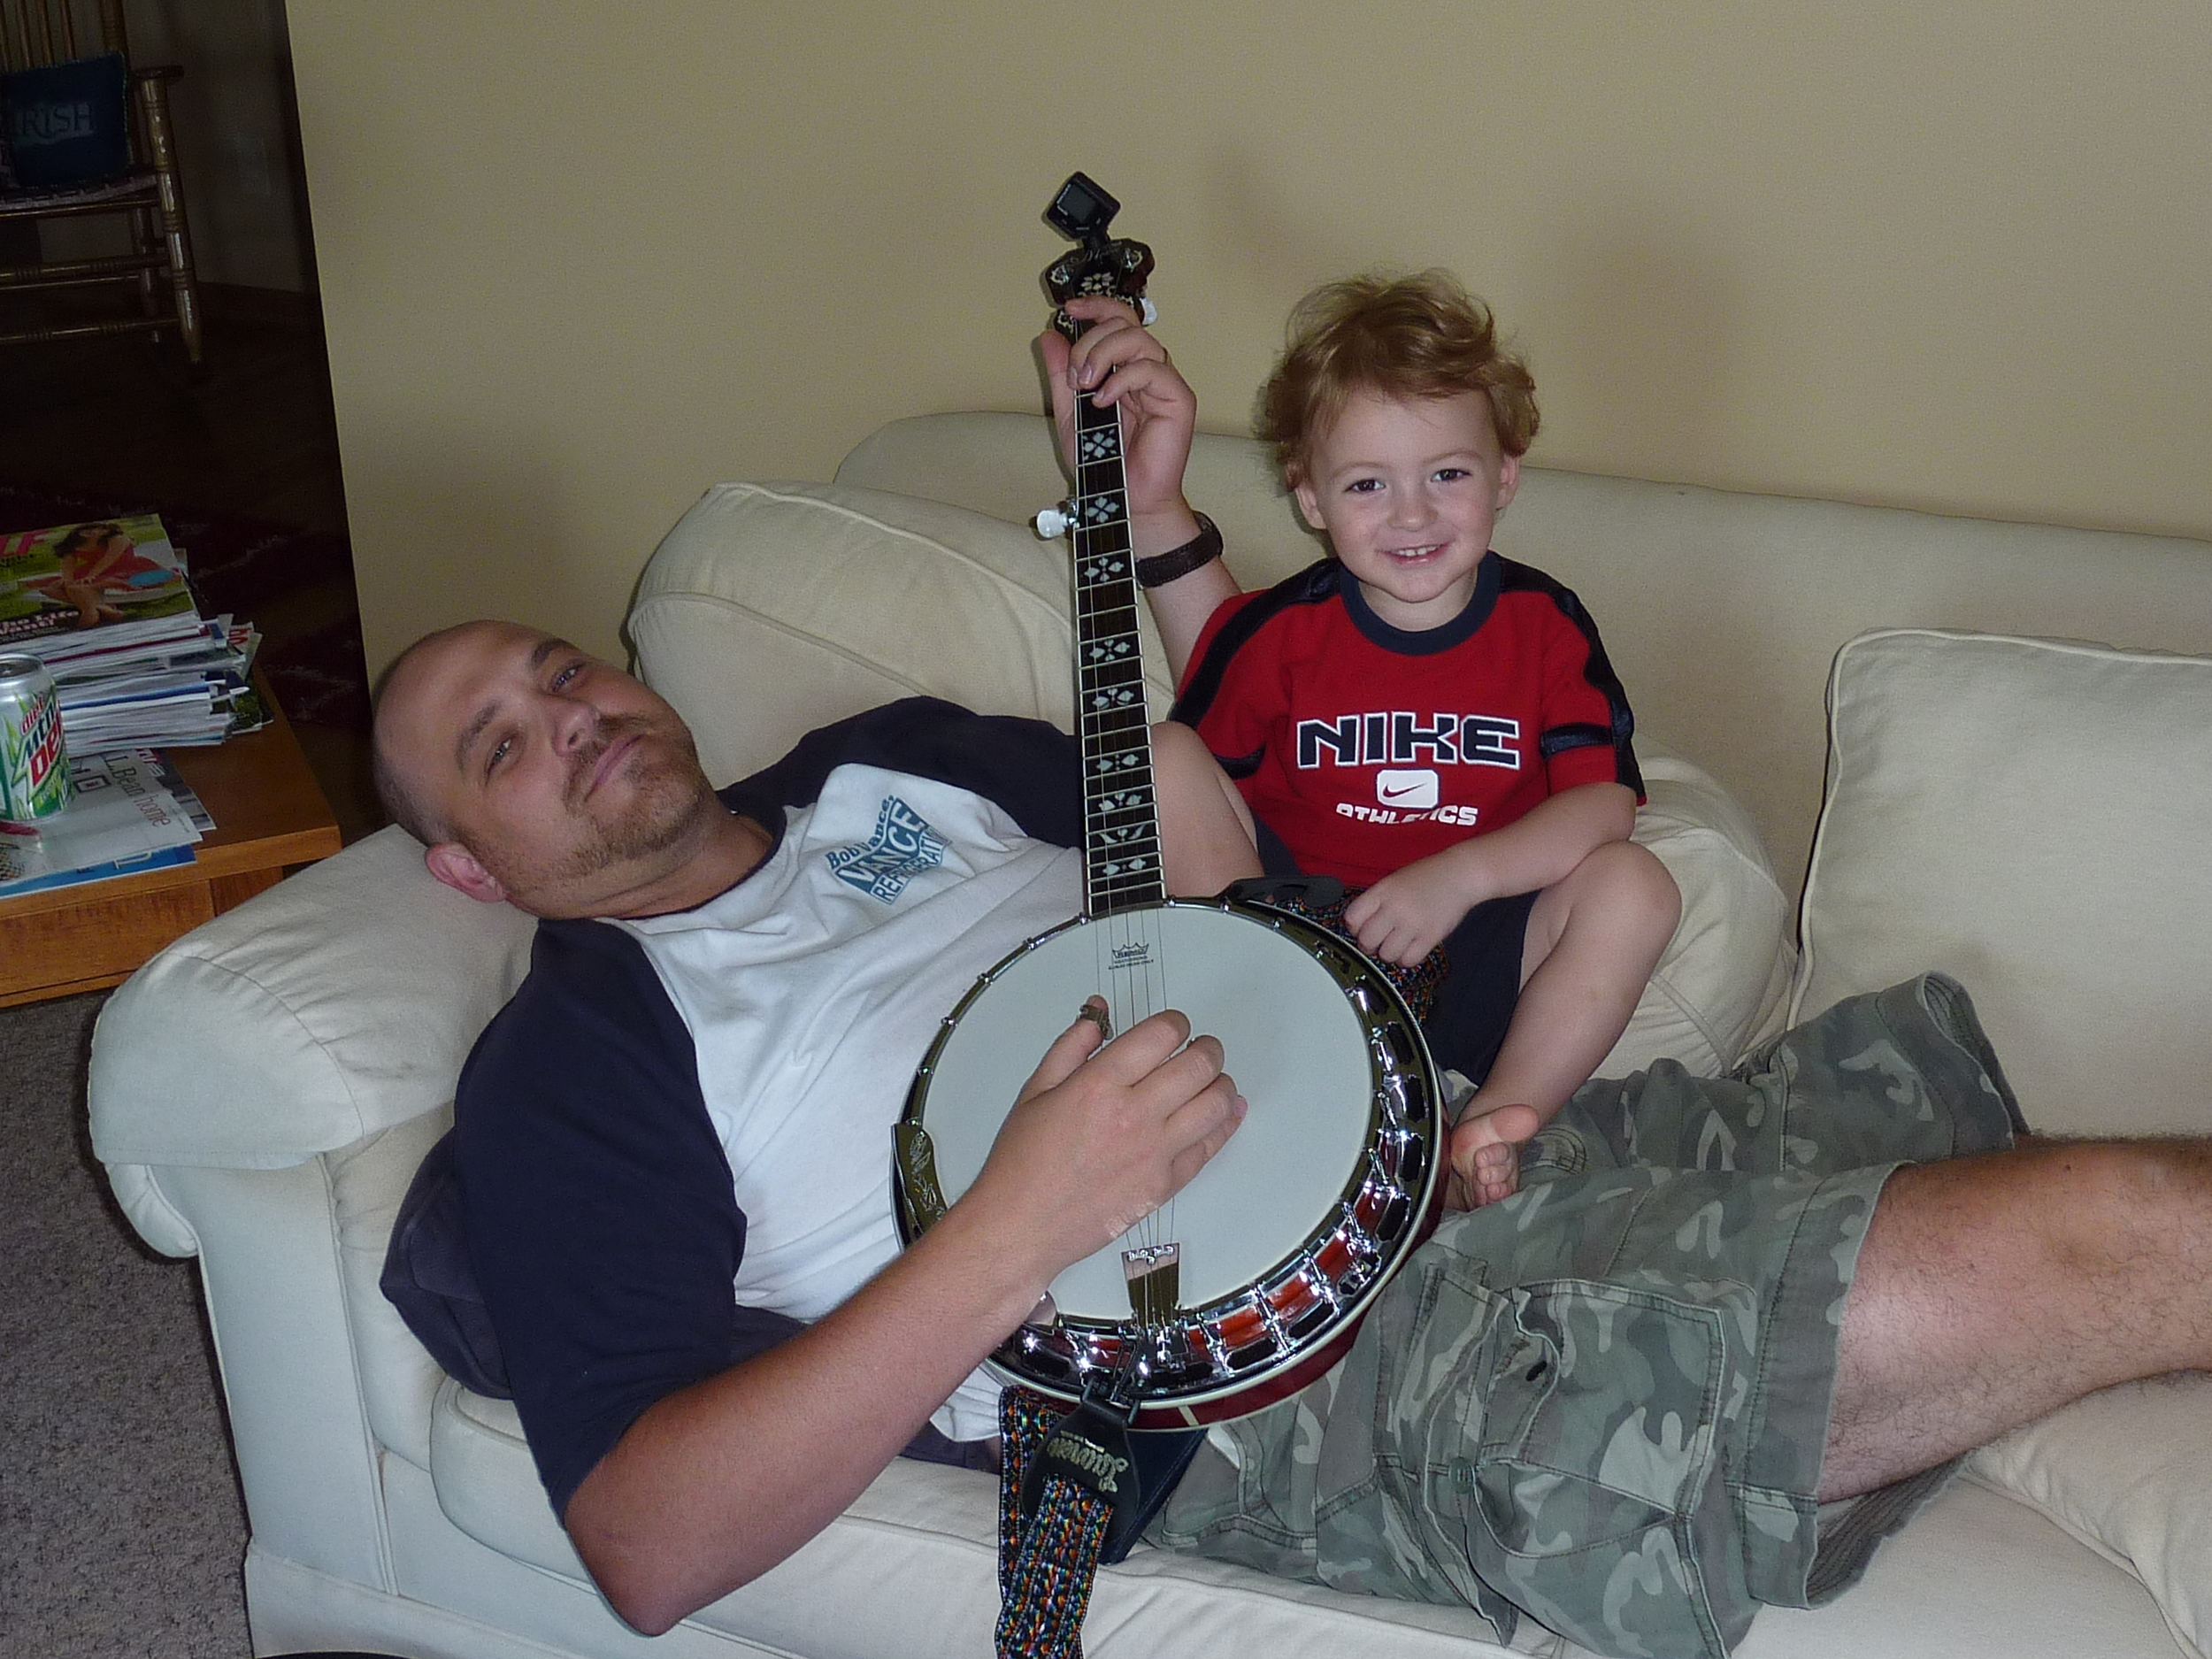 VanceAndLuke_banjo.JPG